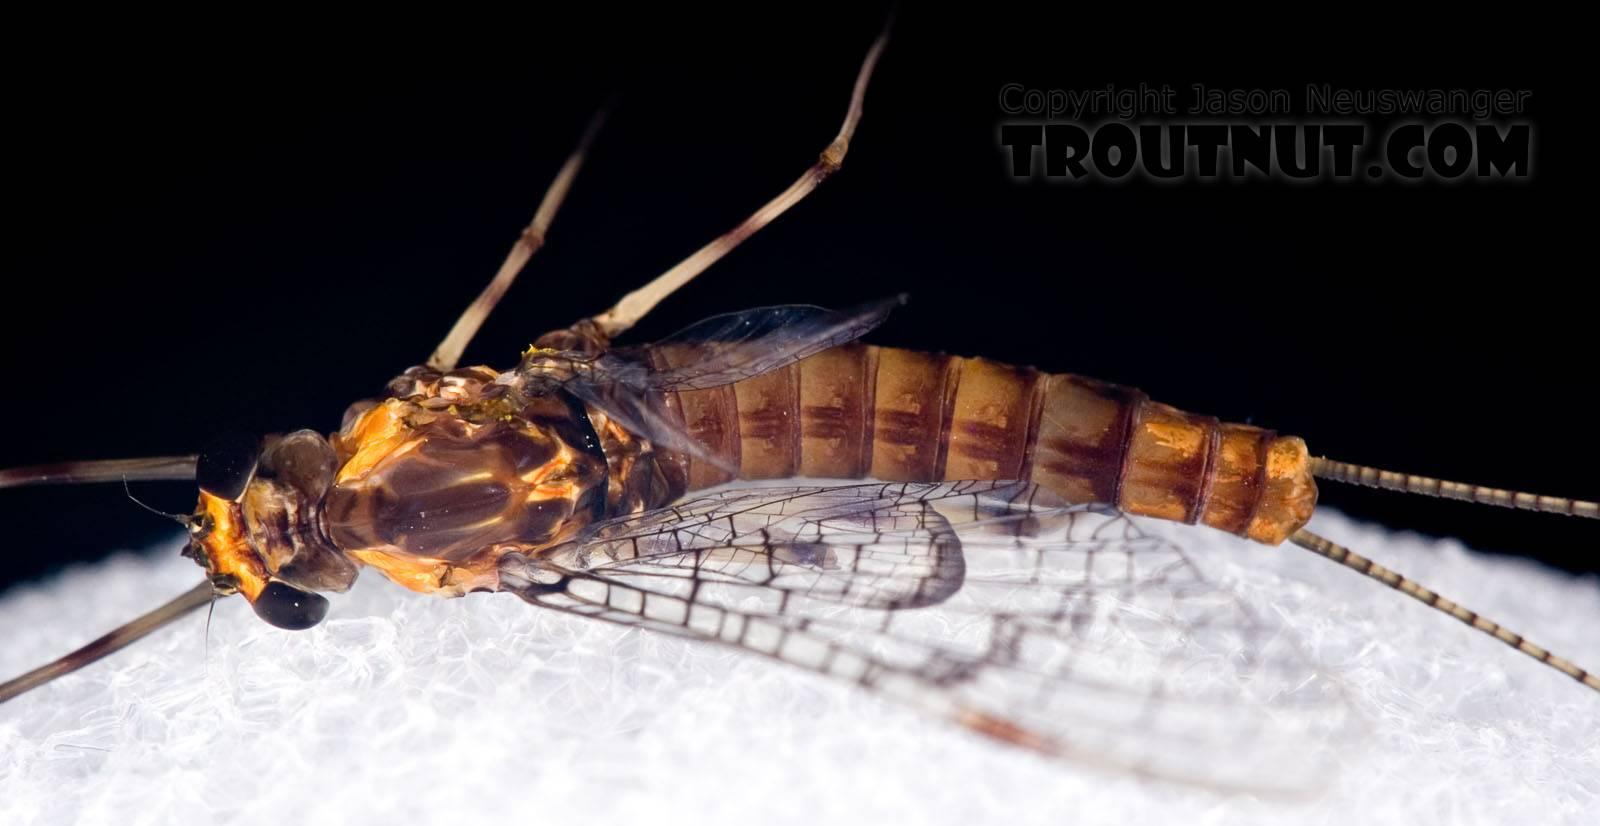 Female Maccaffertium pudicum Mayfly Spinner from Mystery Creek #42 in Pennsylvania